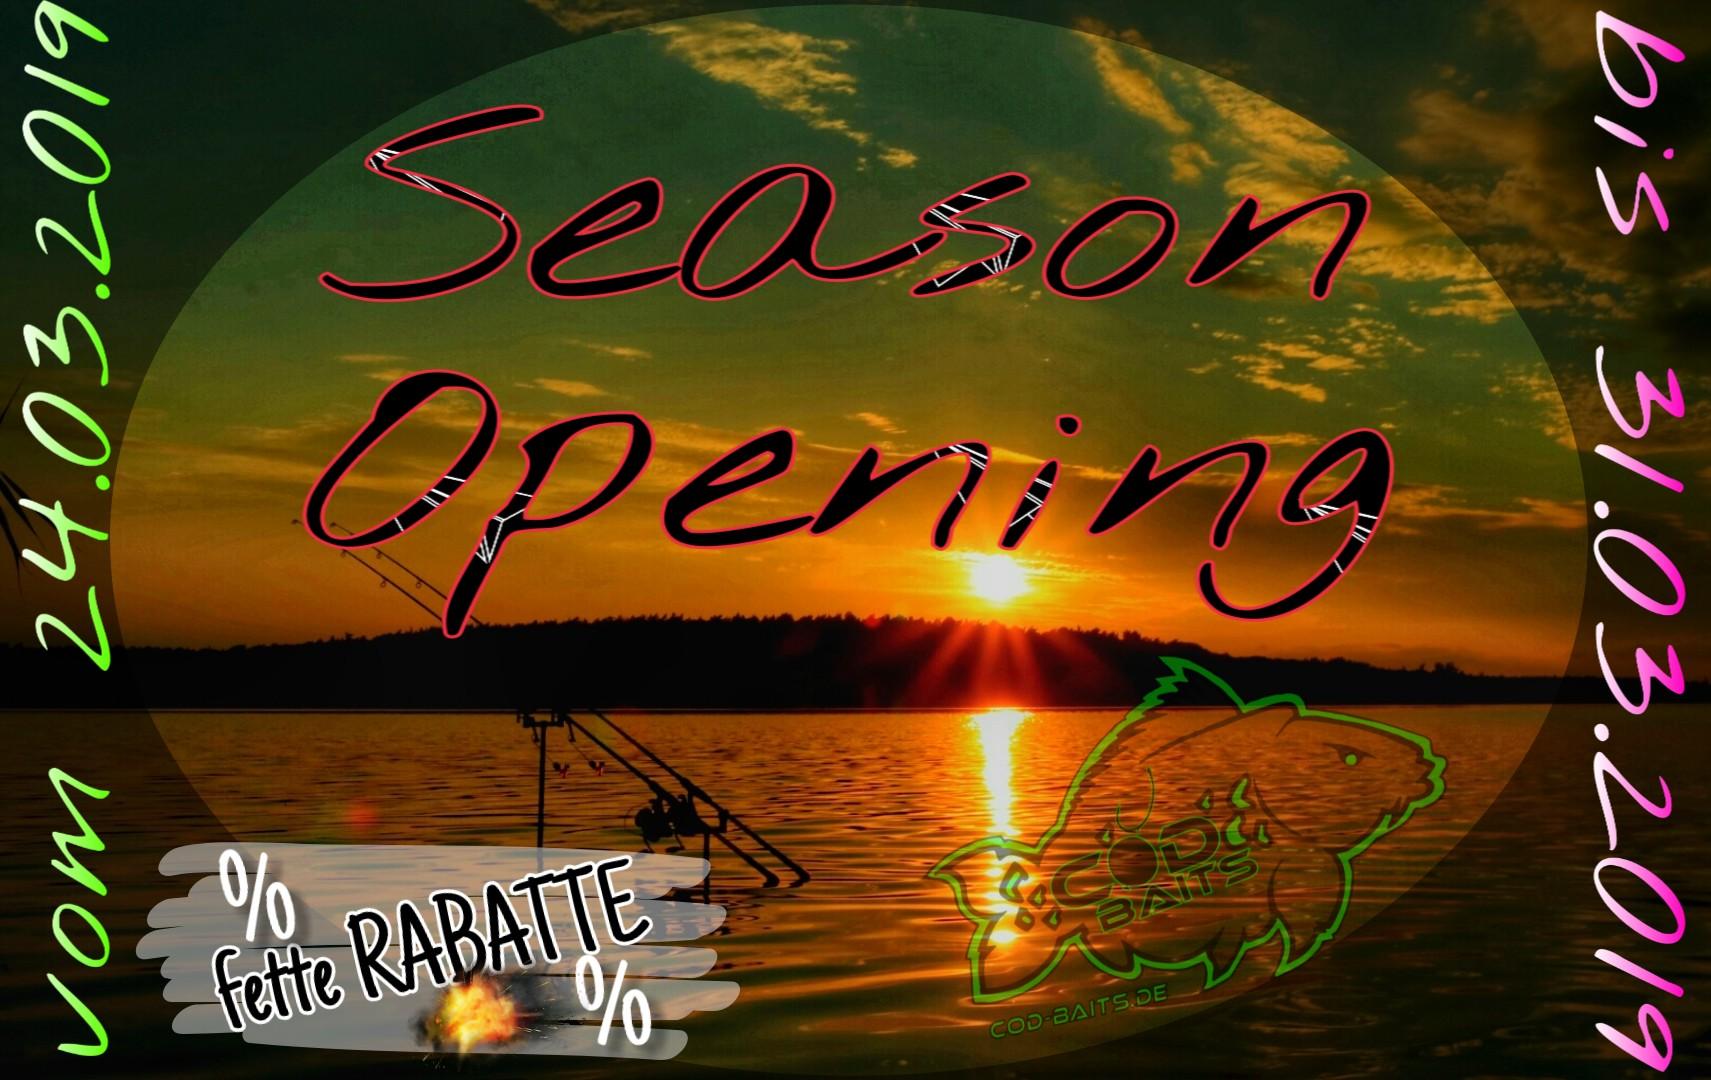 Season Opening